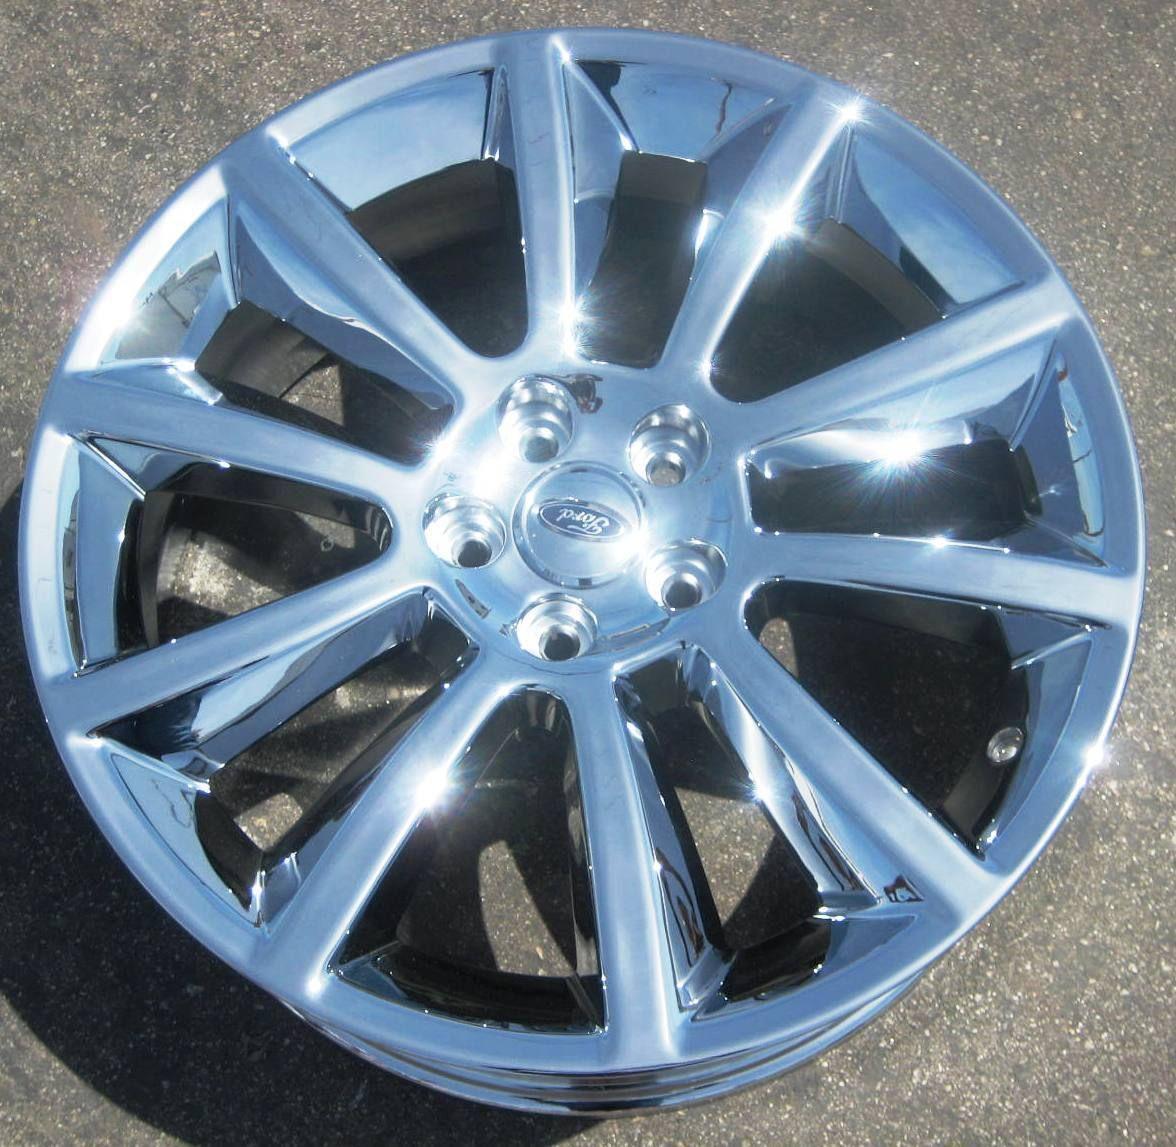 New 20 Factory Ford Flex Chrome Wheels Rims 2010 2012 Exchange Your